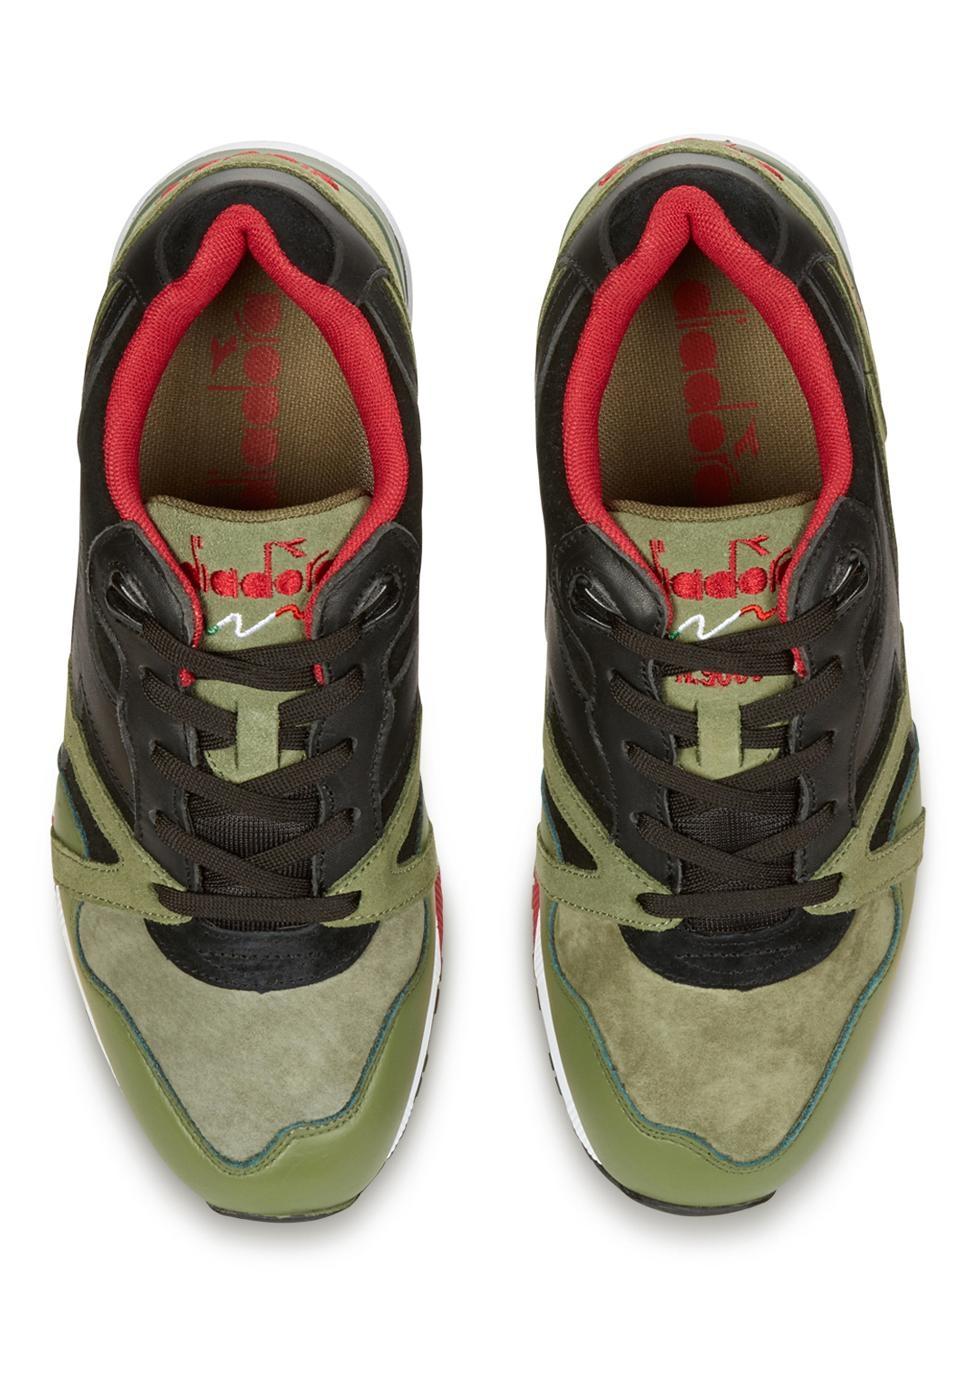 Diadora N9000 Men S Sneakers In Khaki Suede Leather Italian Boutique